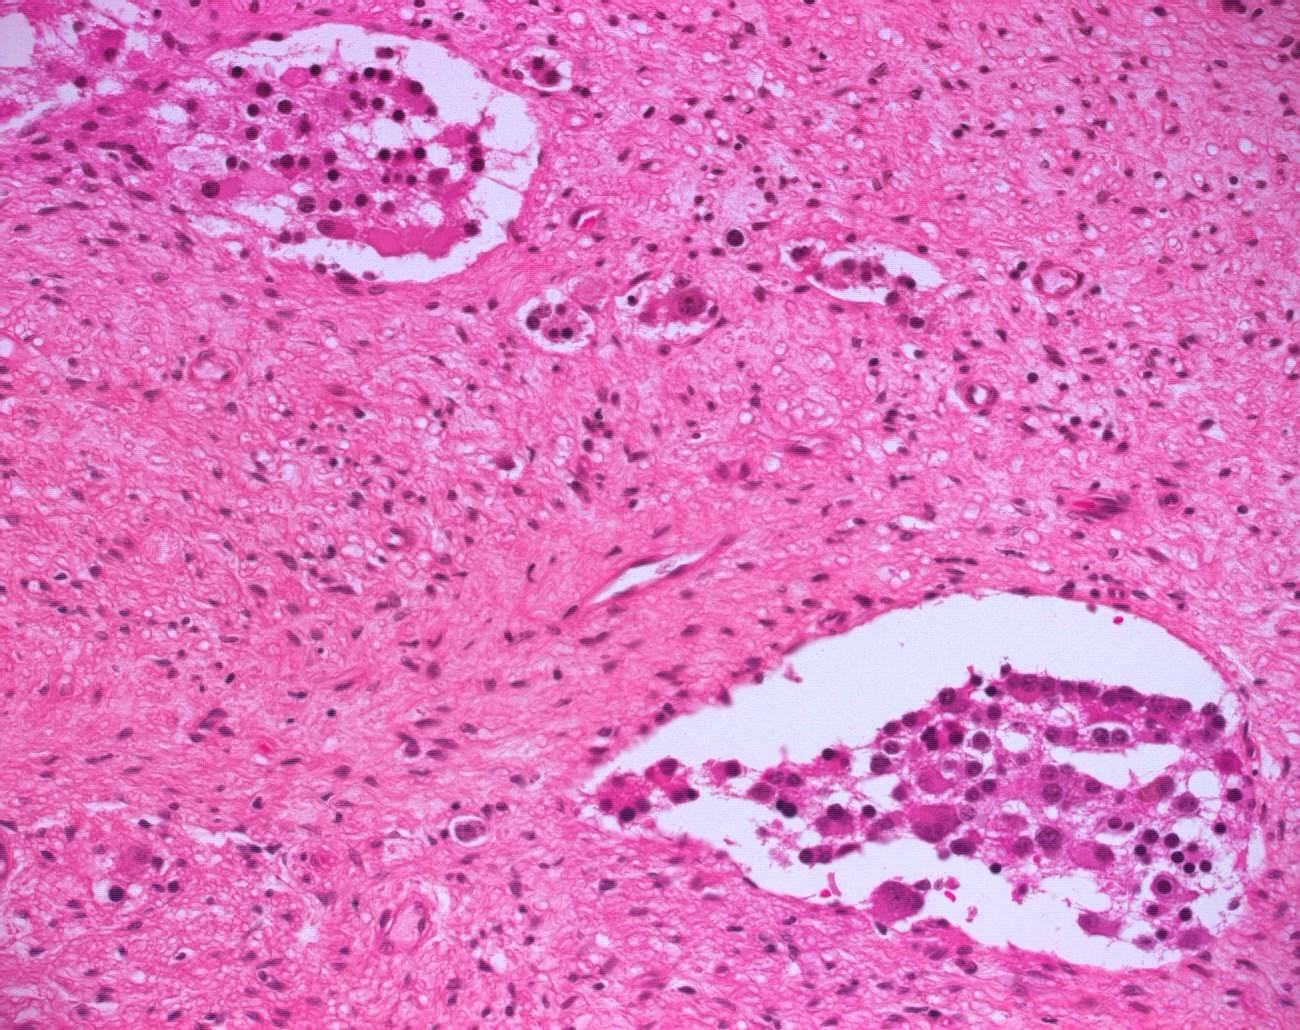 pelvic ganglioneuroblastoma humpathcom human pathology